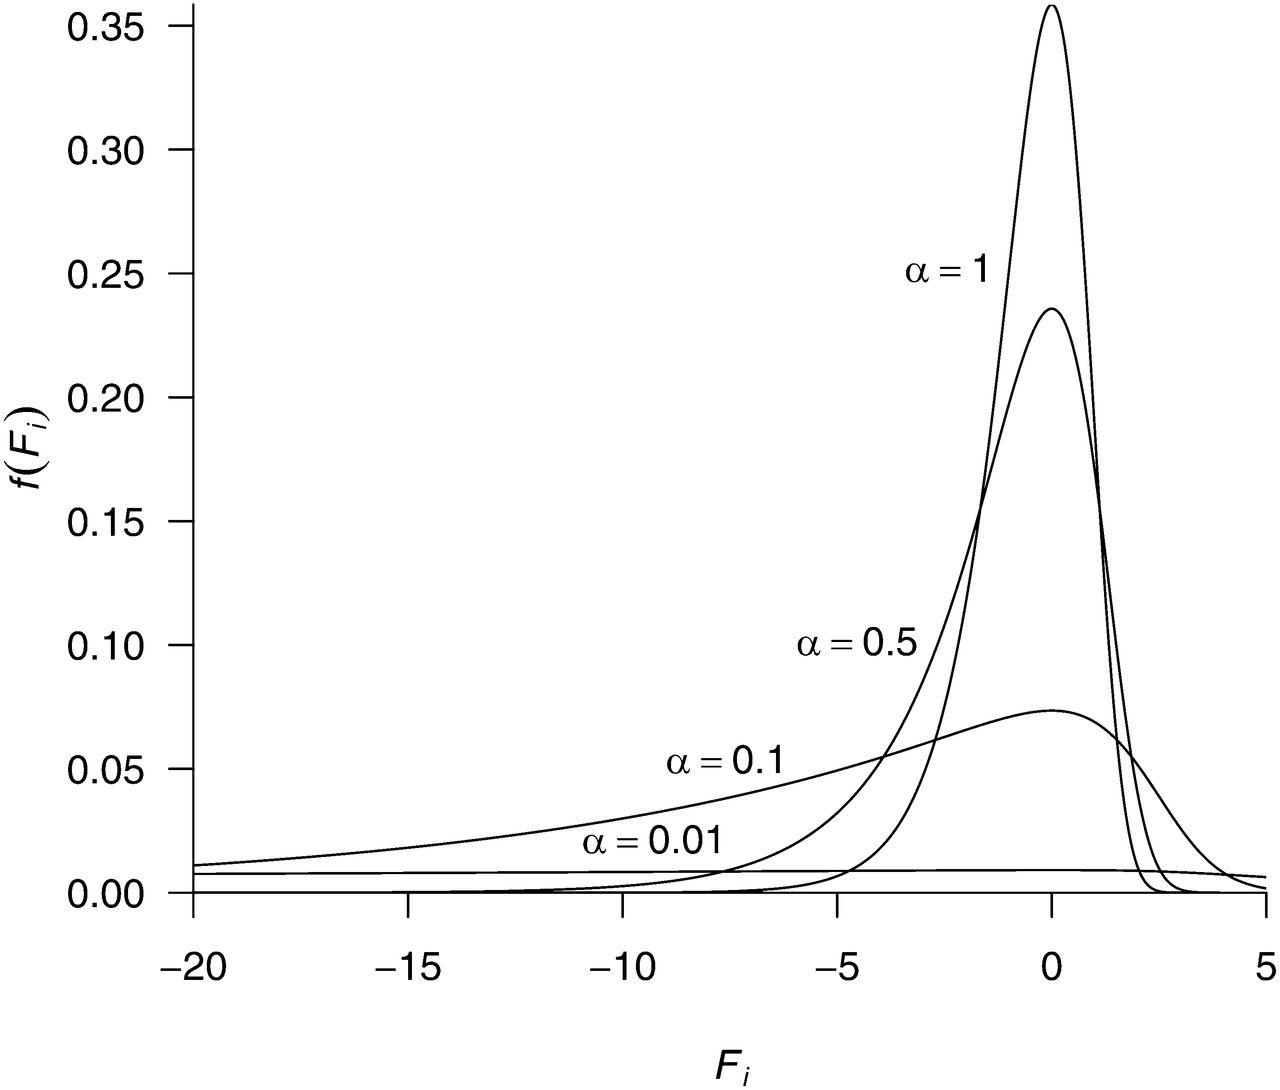 1280x1090 A Penalized Likelihood Method To Estimate The Distribution